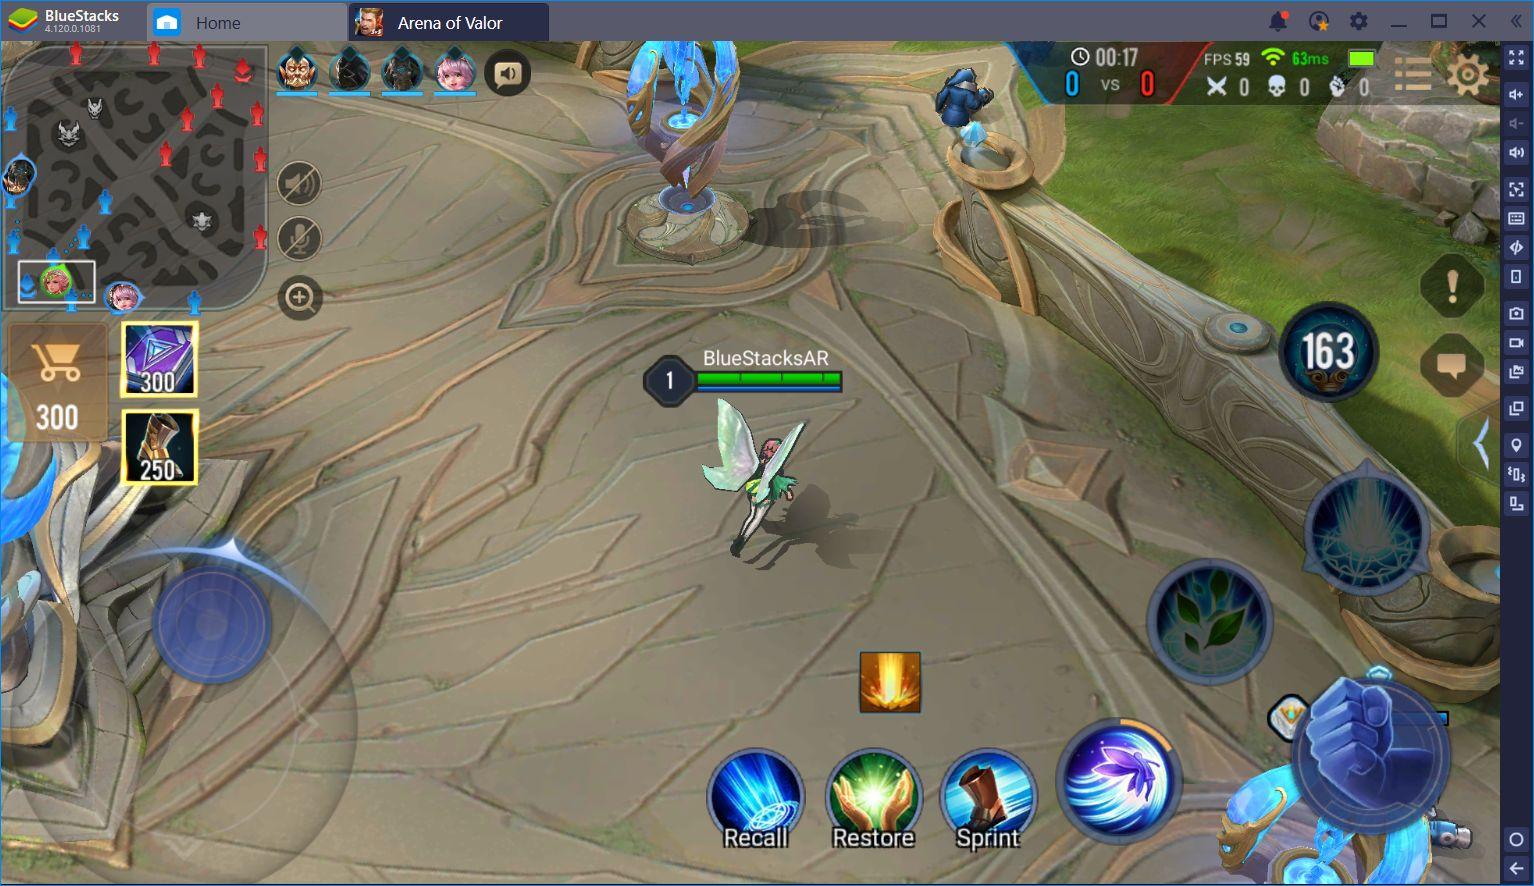 Arena of Valor on BlueStacks: Dominate Using the Keymapping Tool